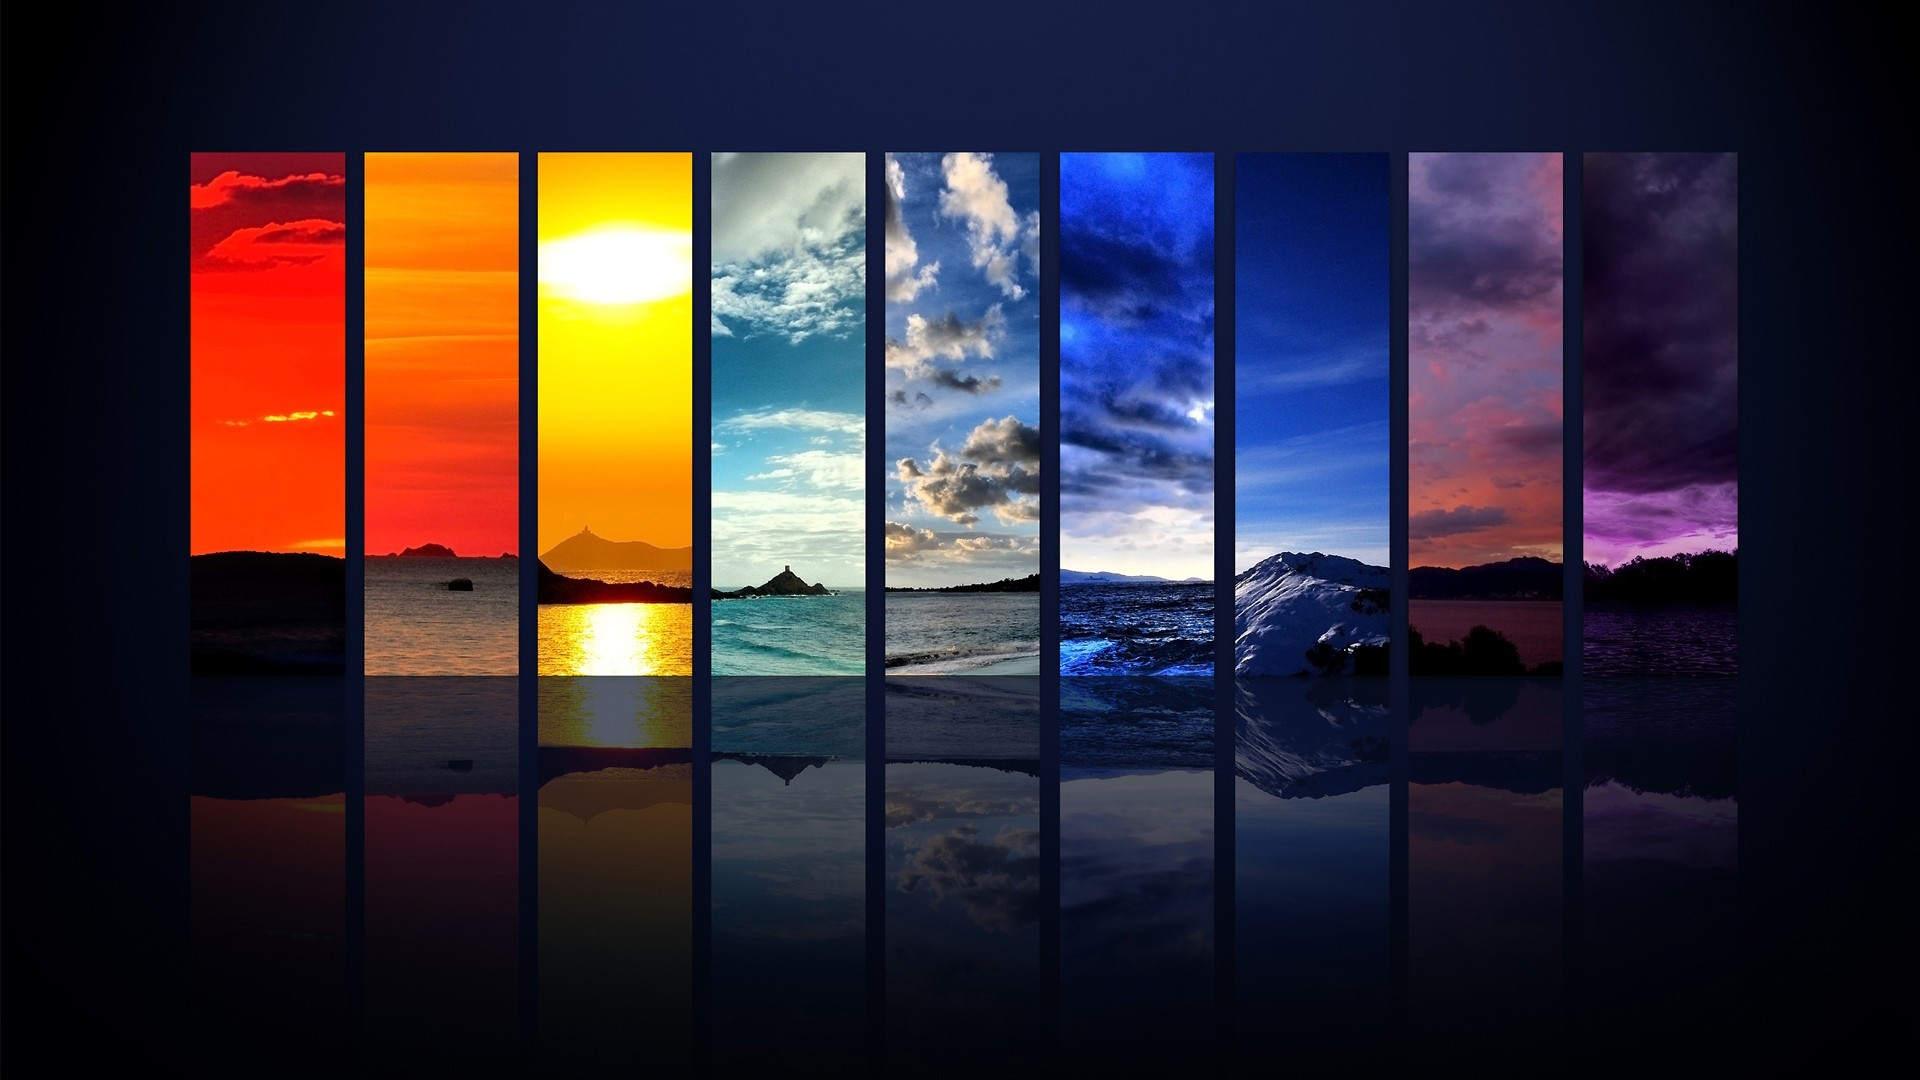 1920x1080 cool desktop backgrounds hd wallpaper1 wallpapers55 com best